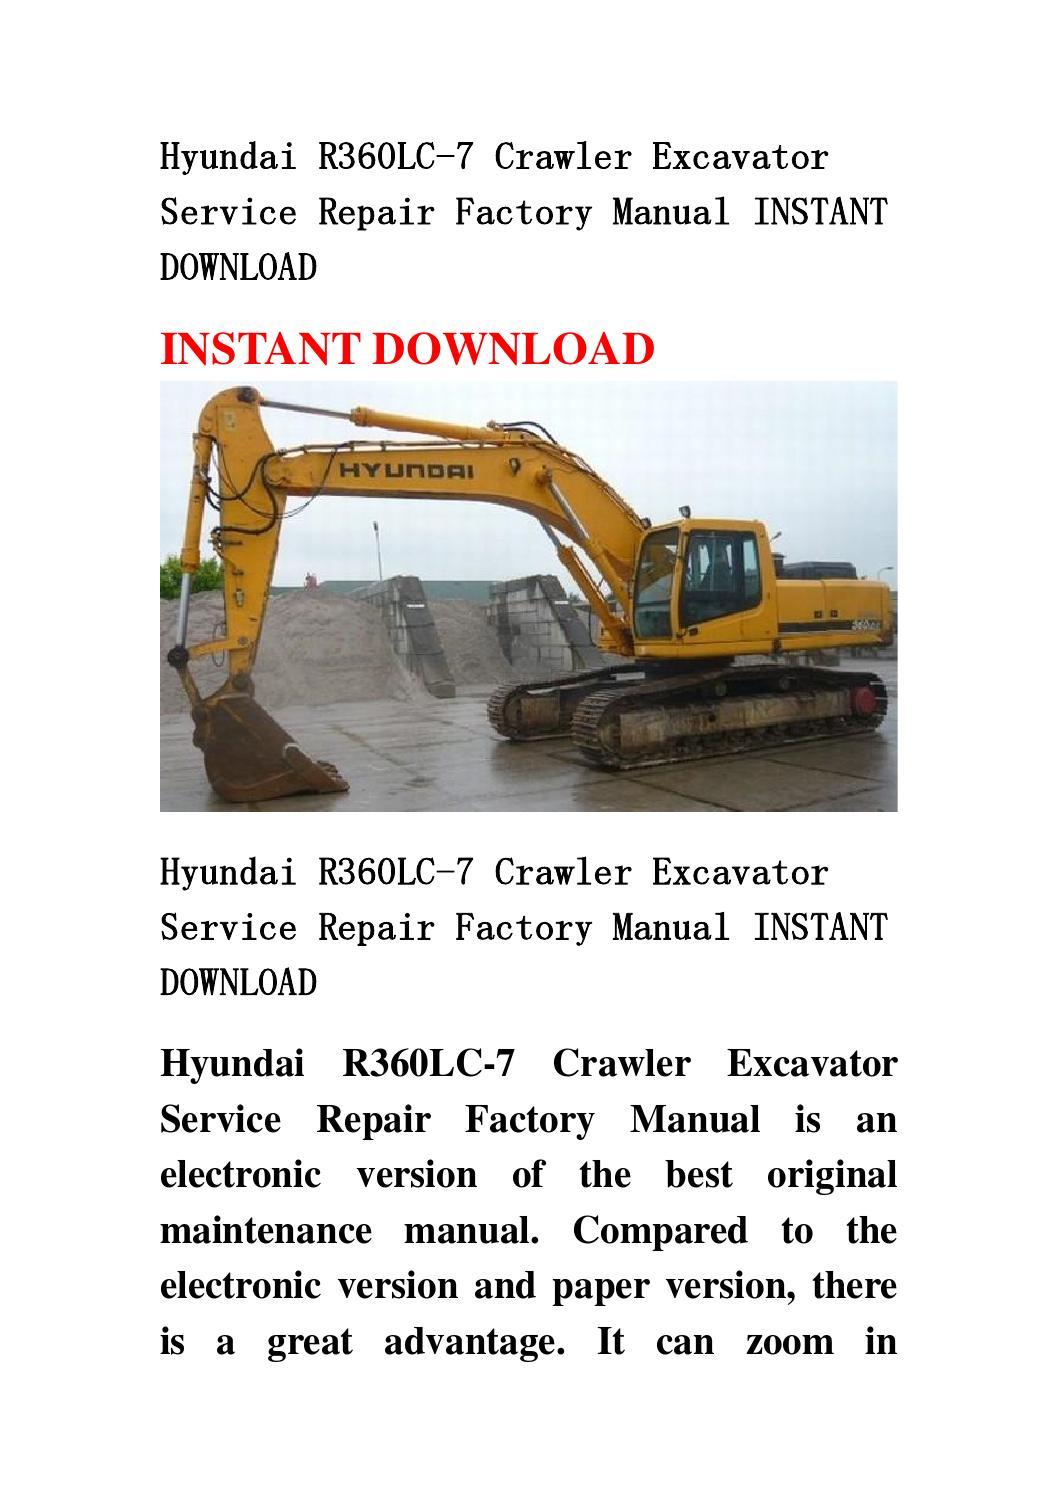 hyundai r360lc 7 crawler excavator service repair factory